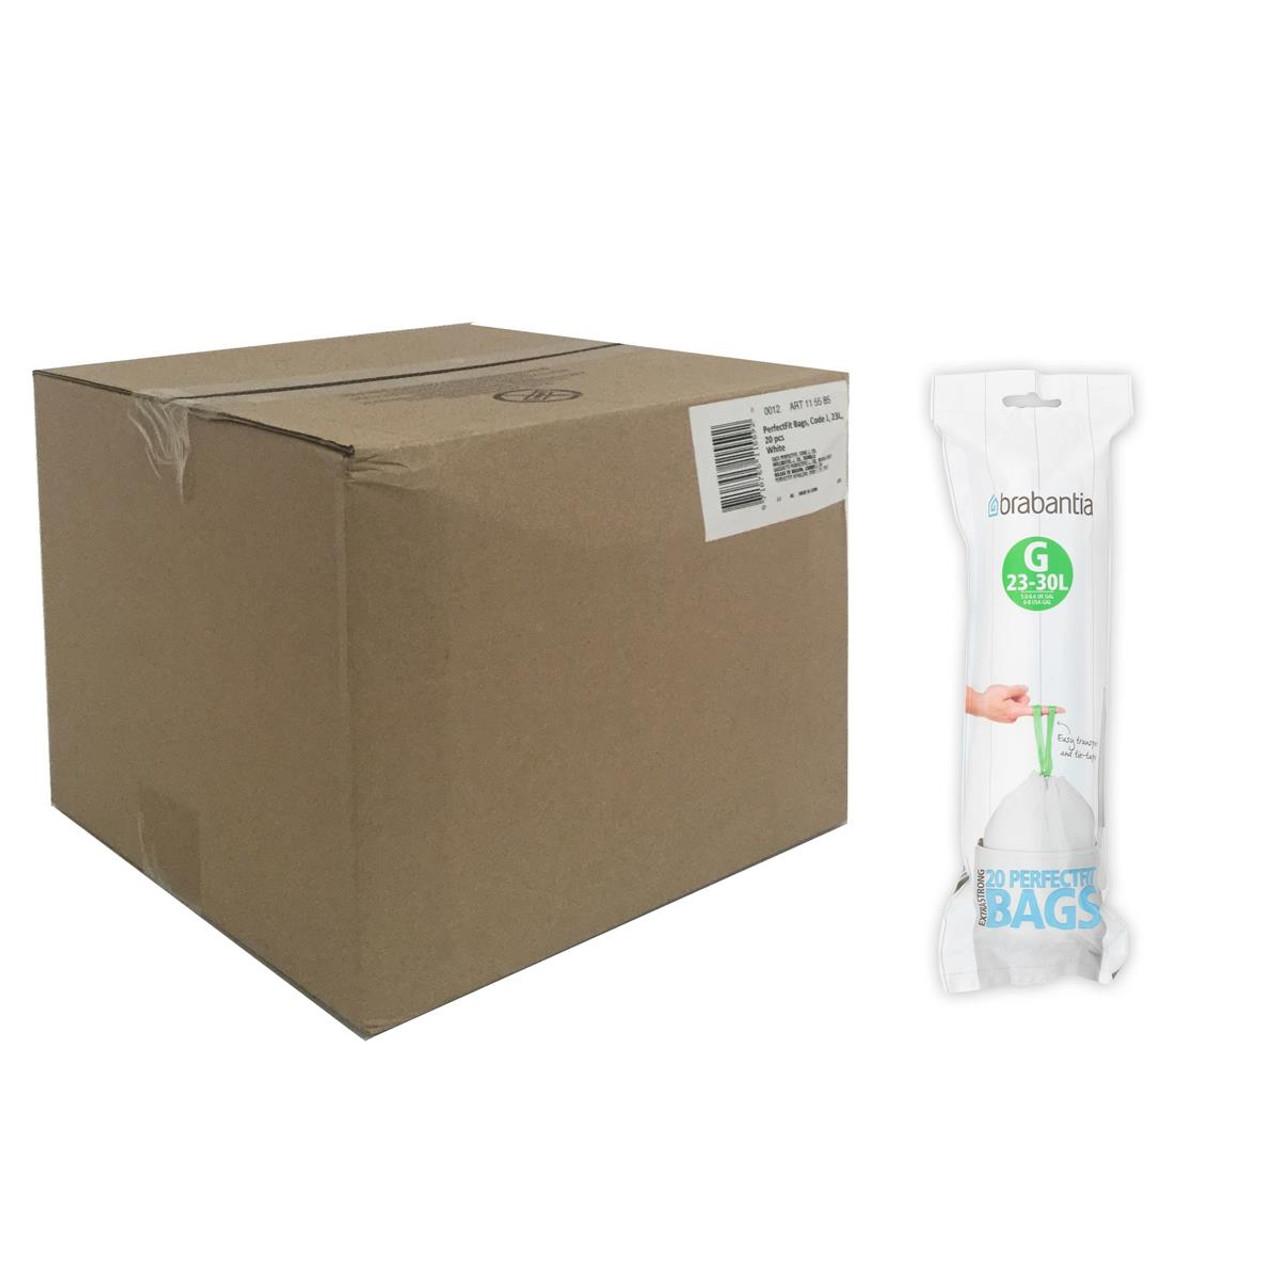 5 Litre Brabantia Waste Bin Liners PerfectFit Bags Size Code B 20 Pack 5L